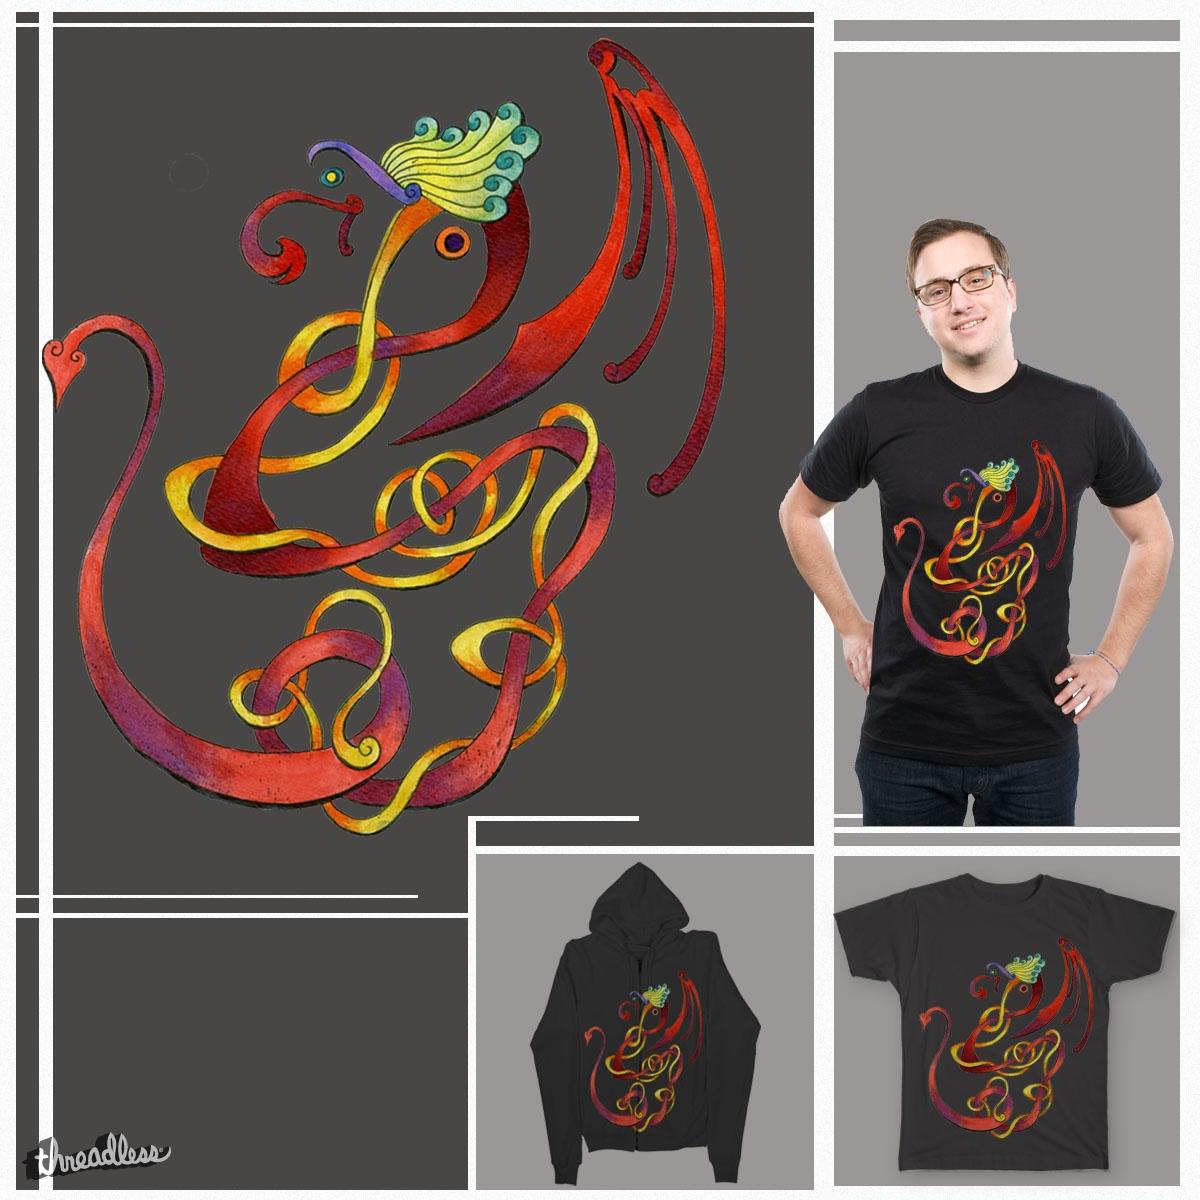 Dancing Dragon by SarinneG on Threadless